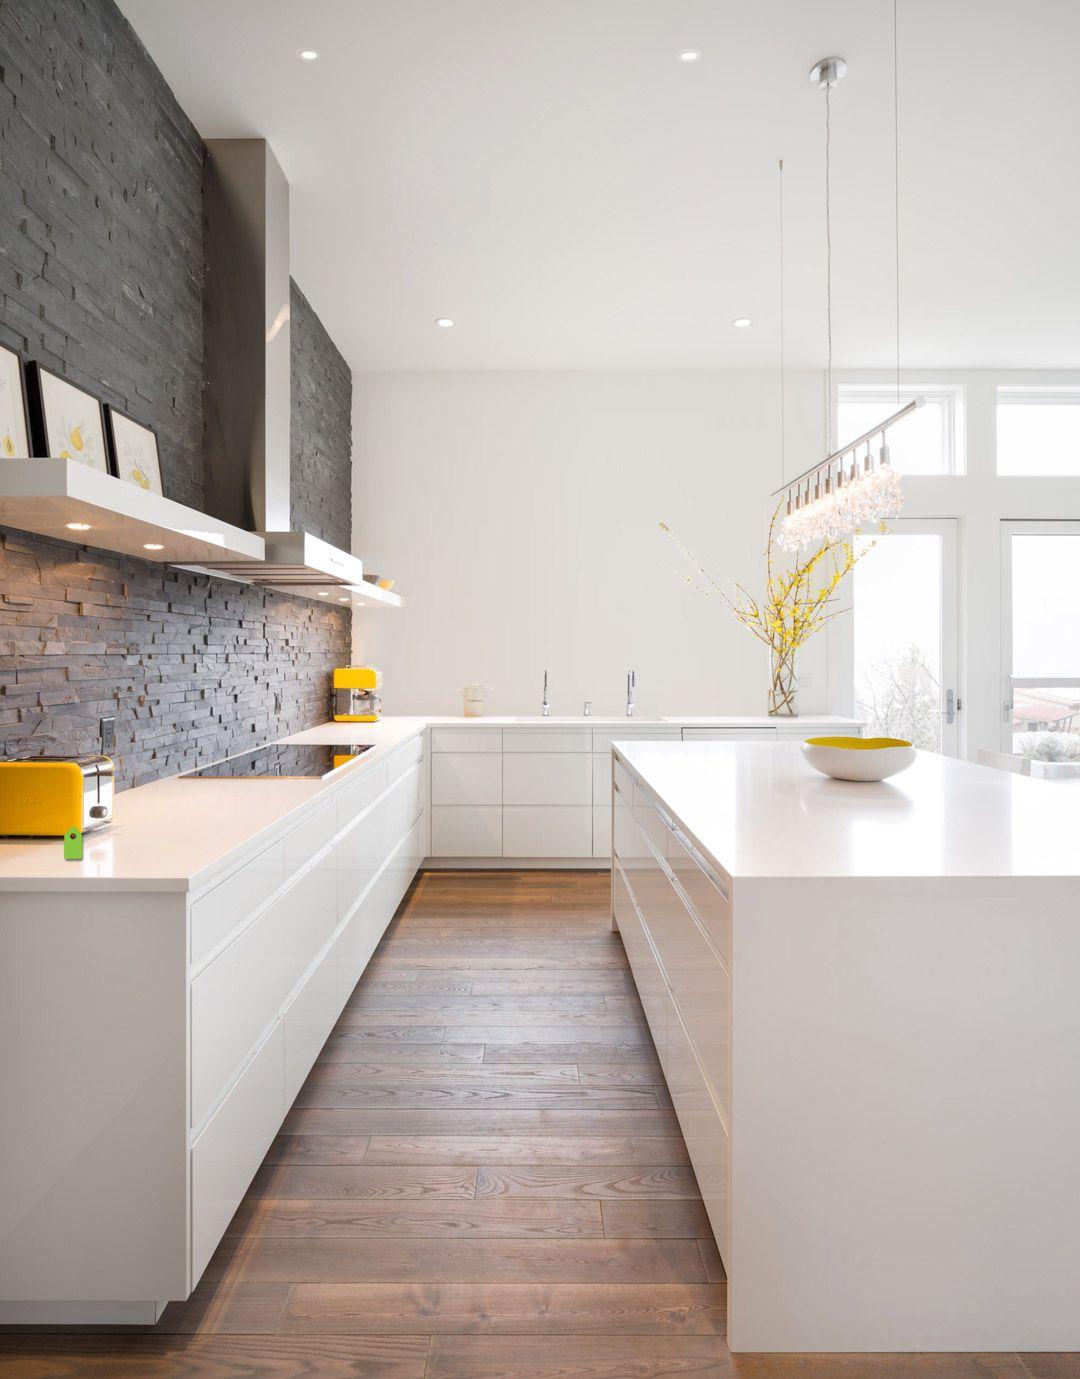 100 idee di cucine moderne con elementi in legno | Mattoni, Cucina ...